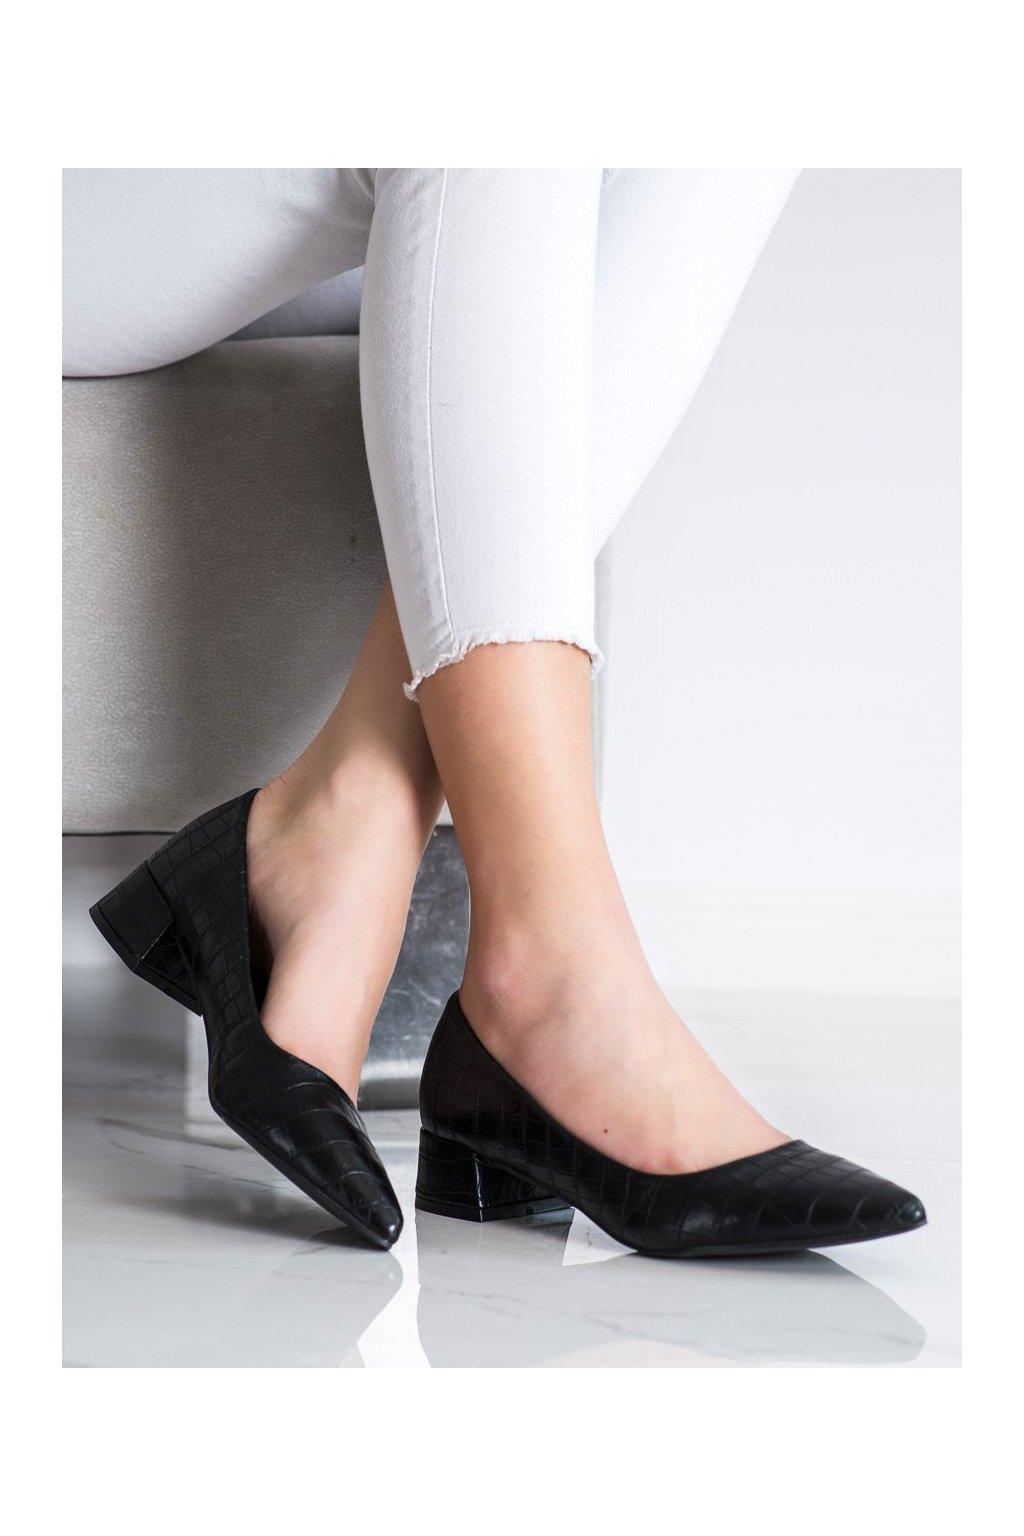 Čierne dámske lodičky Sweet shoes kod 3845B